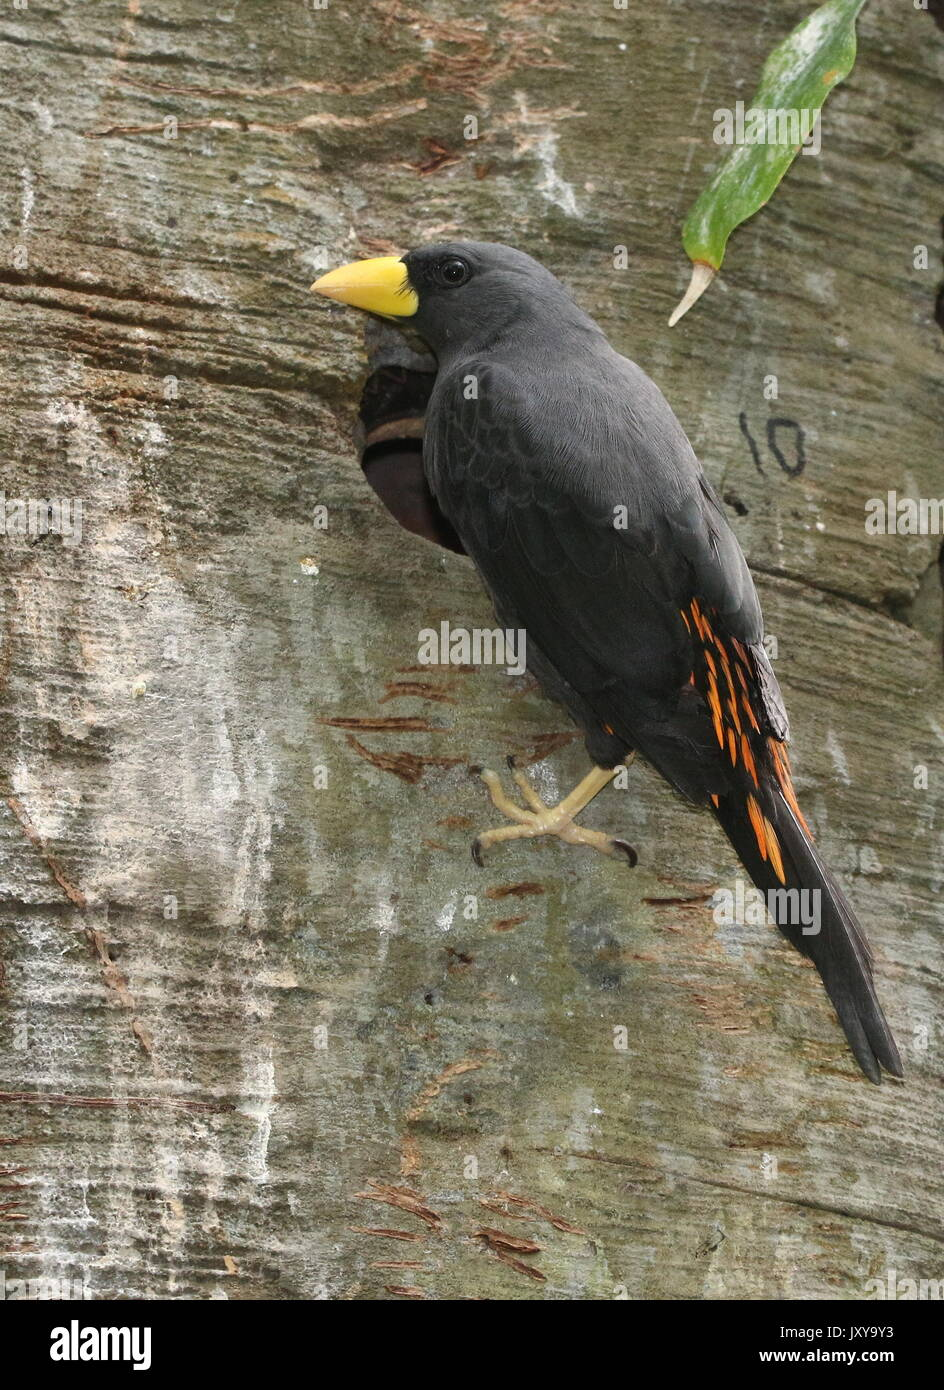 Sulawesi  Grosbeak starling or grosbeak myna (Scissirostrum dubium) nesting in a tree trunk. A.k.a. Celebes scissor billed starling. - Stock Image